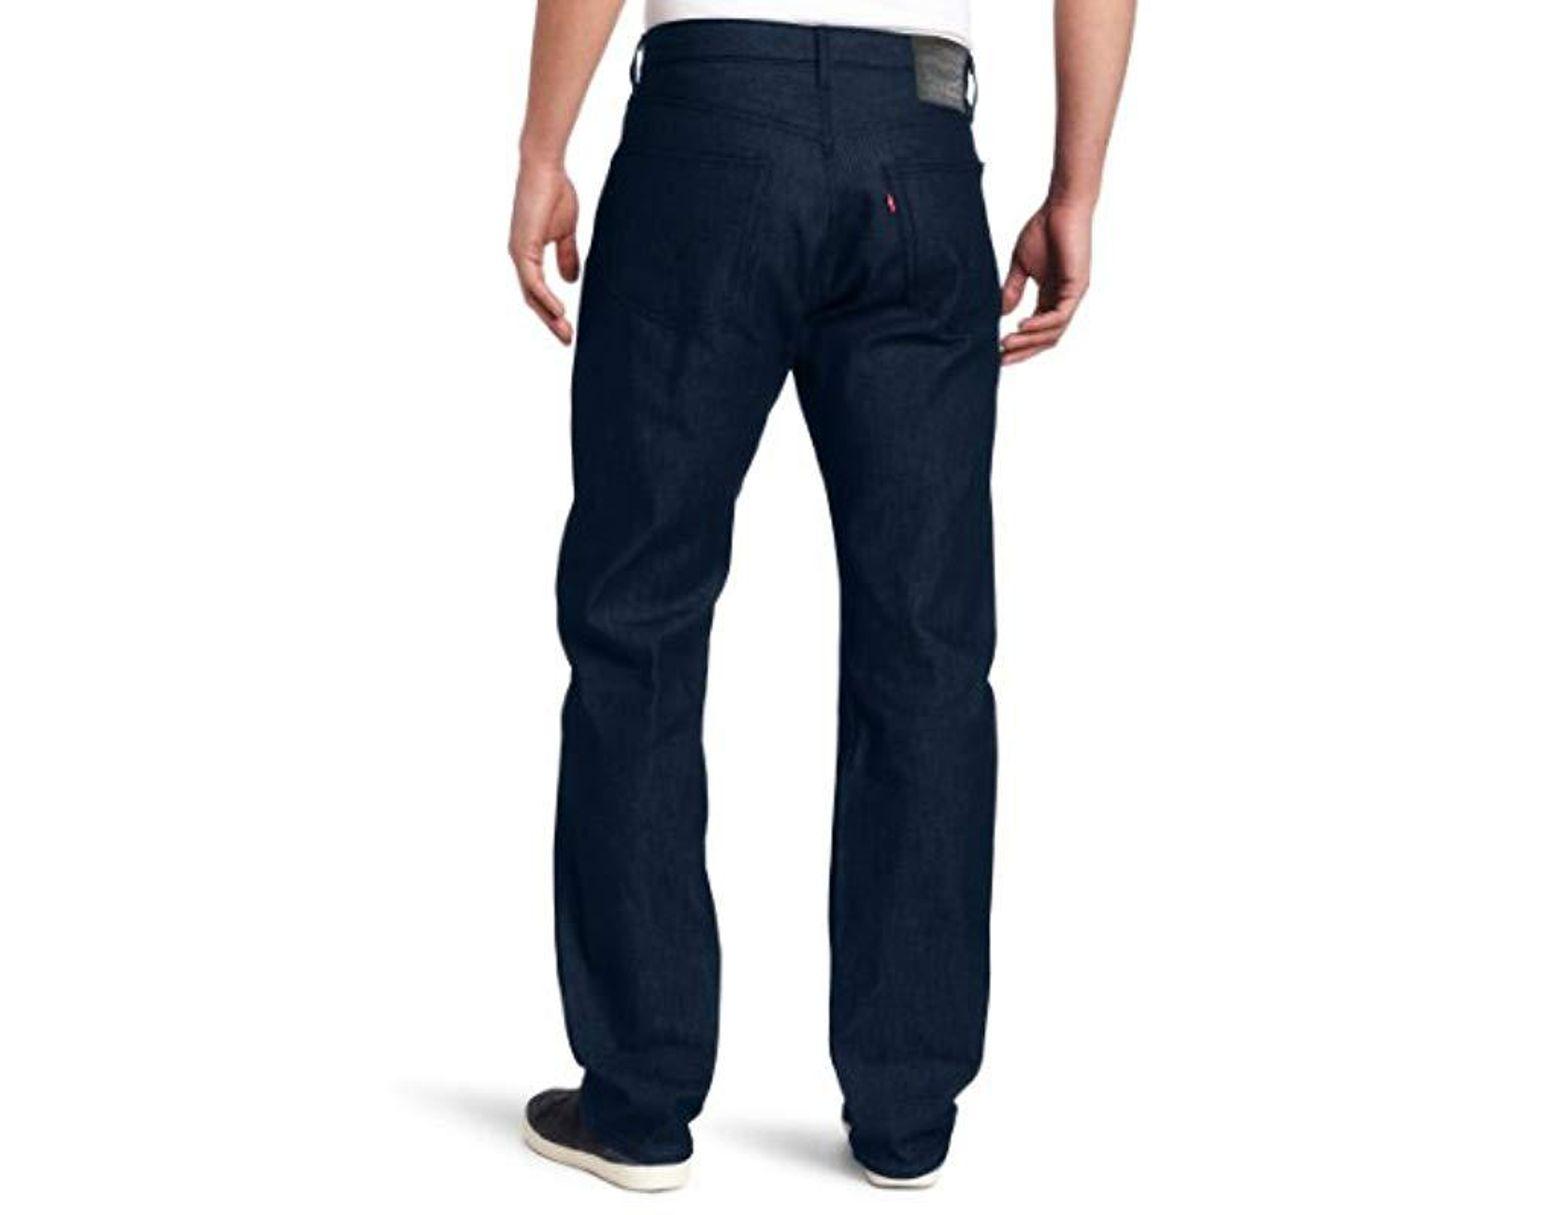 c3669d17487 Levi's 501 Original Shrink-to-fit Jeans in Blue for Men - Save 28% - Lyst